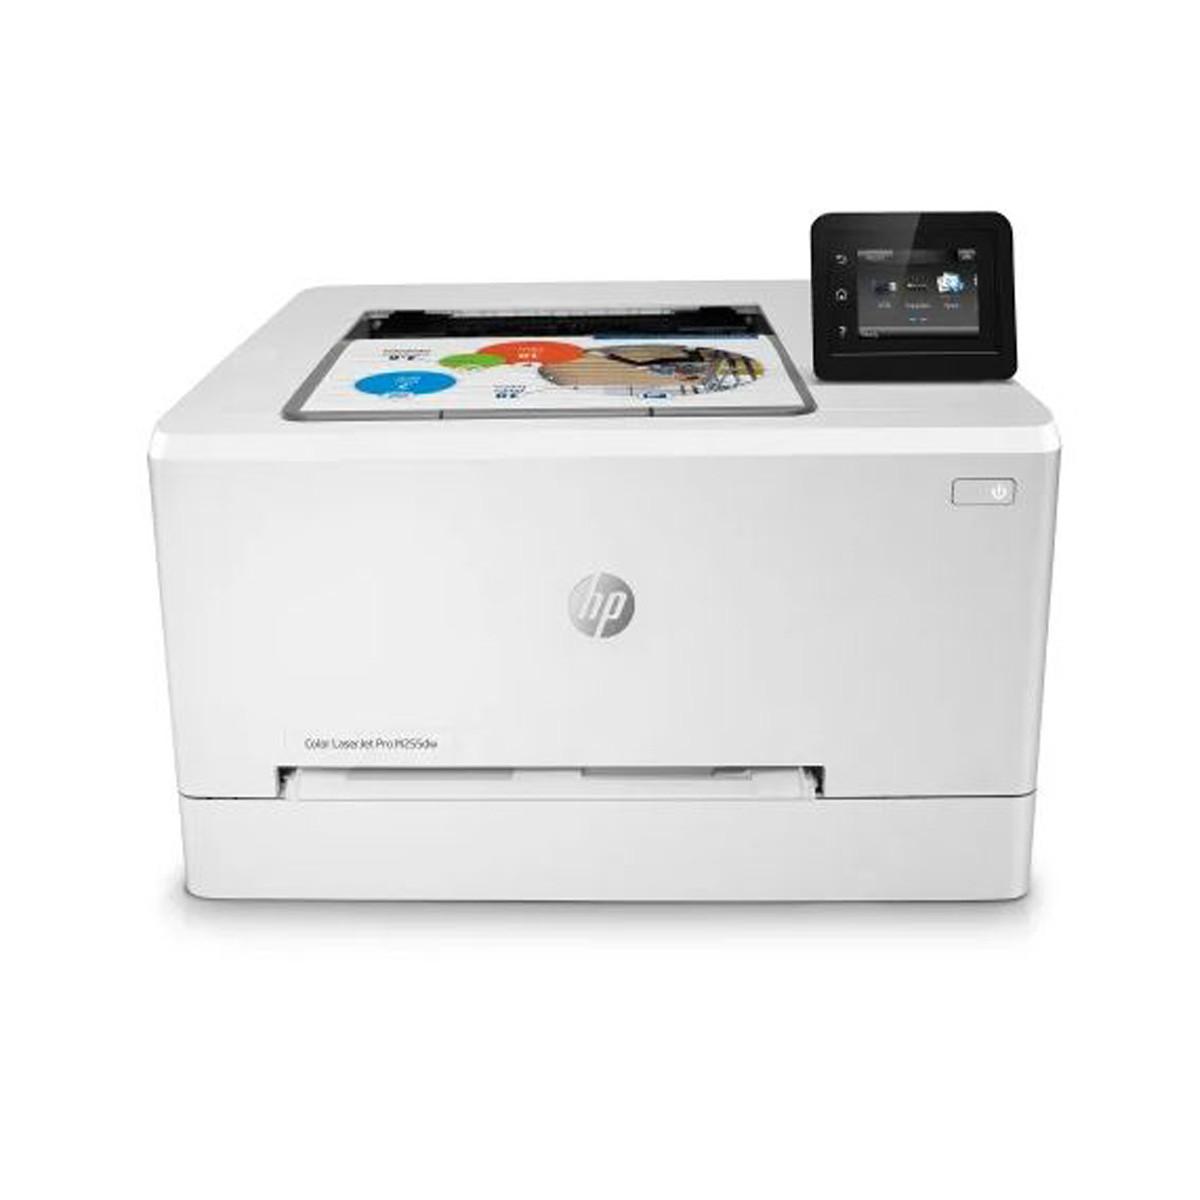 Impressora HP LaserJet Pro M255DW 7KW64A Laser Color com Wireless e Duplex